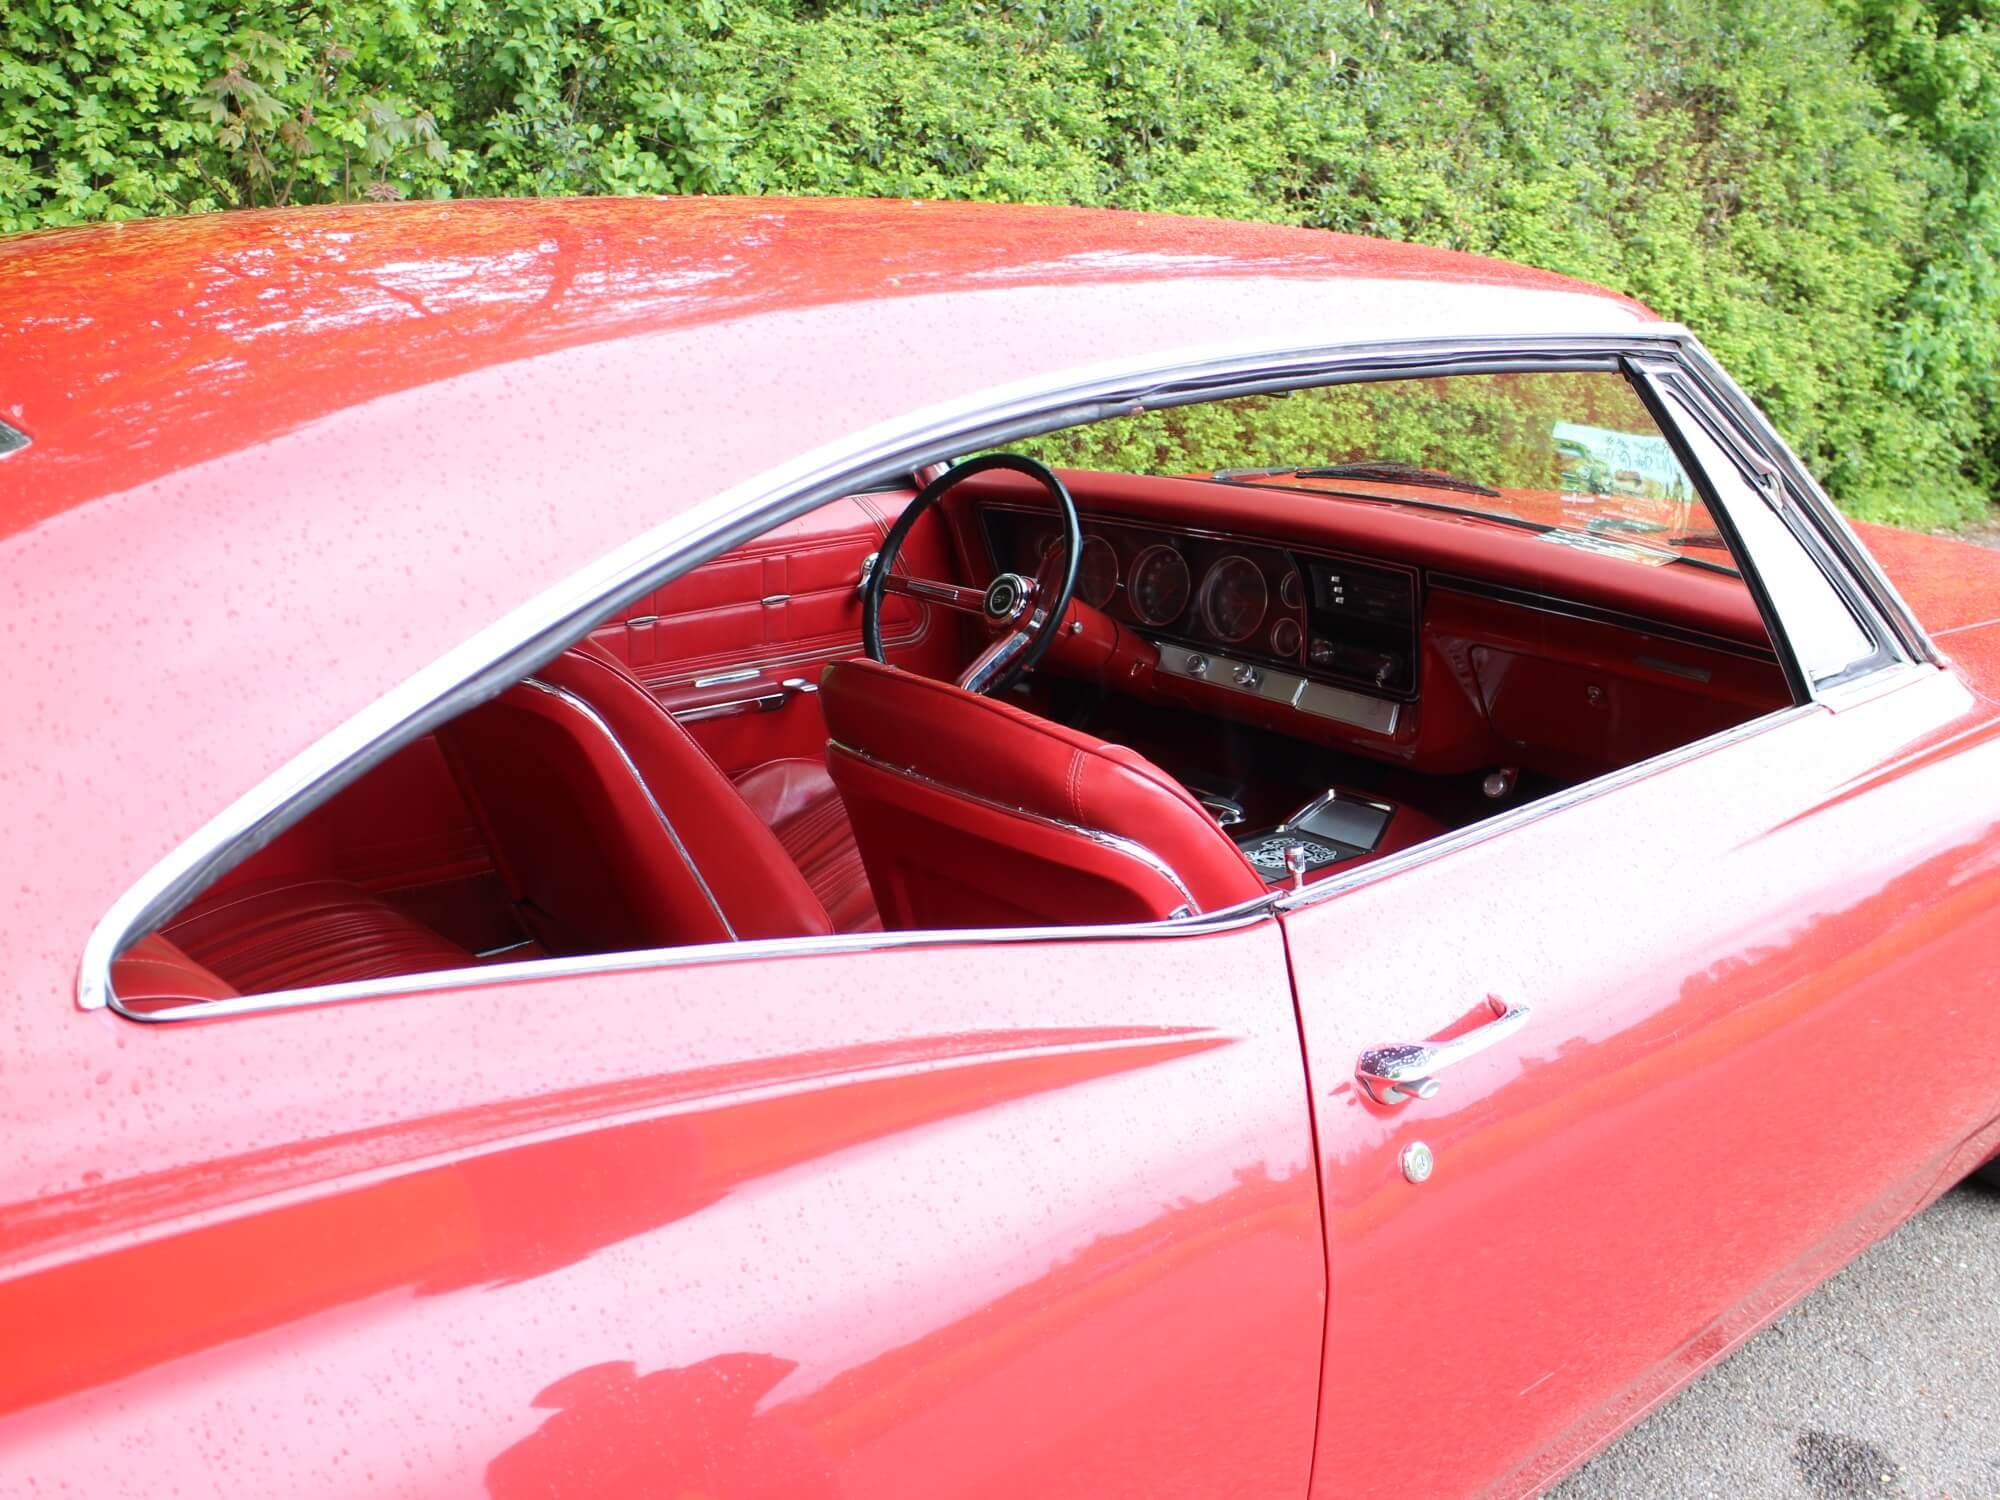 1967 Chevy Impala AUTODROM Moschokarfis